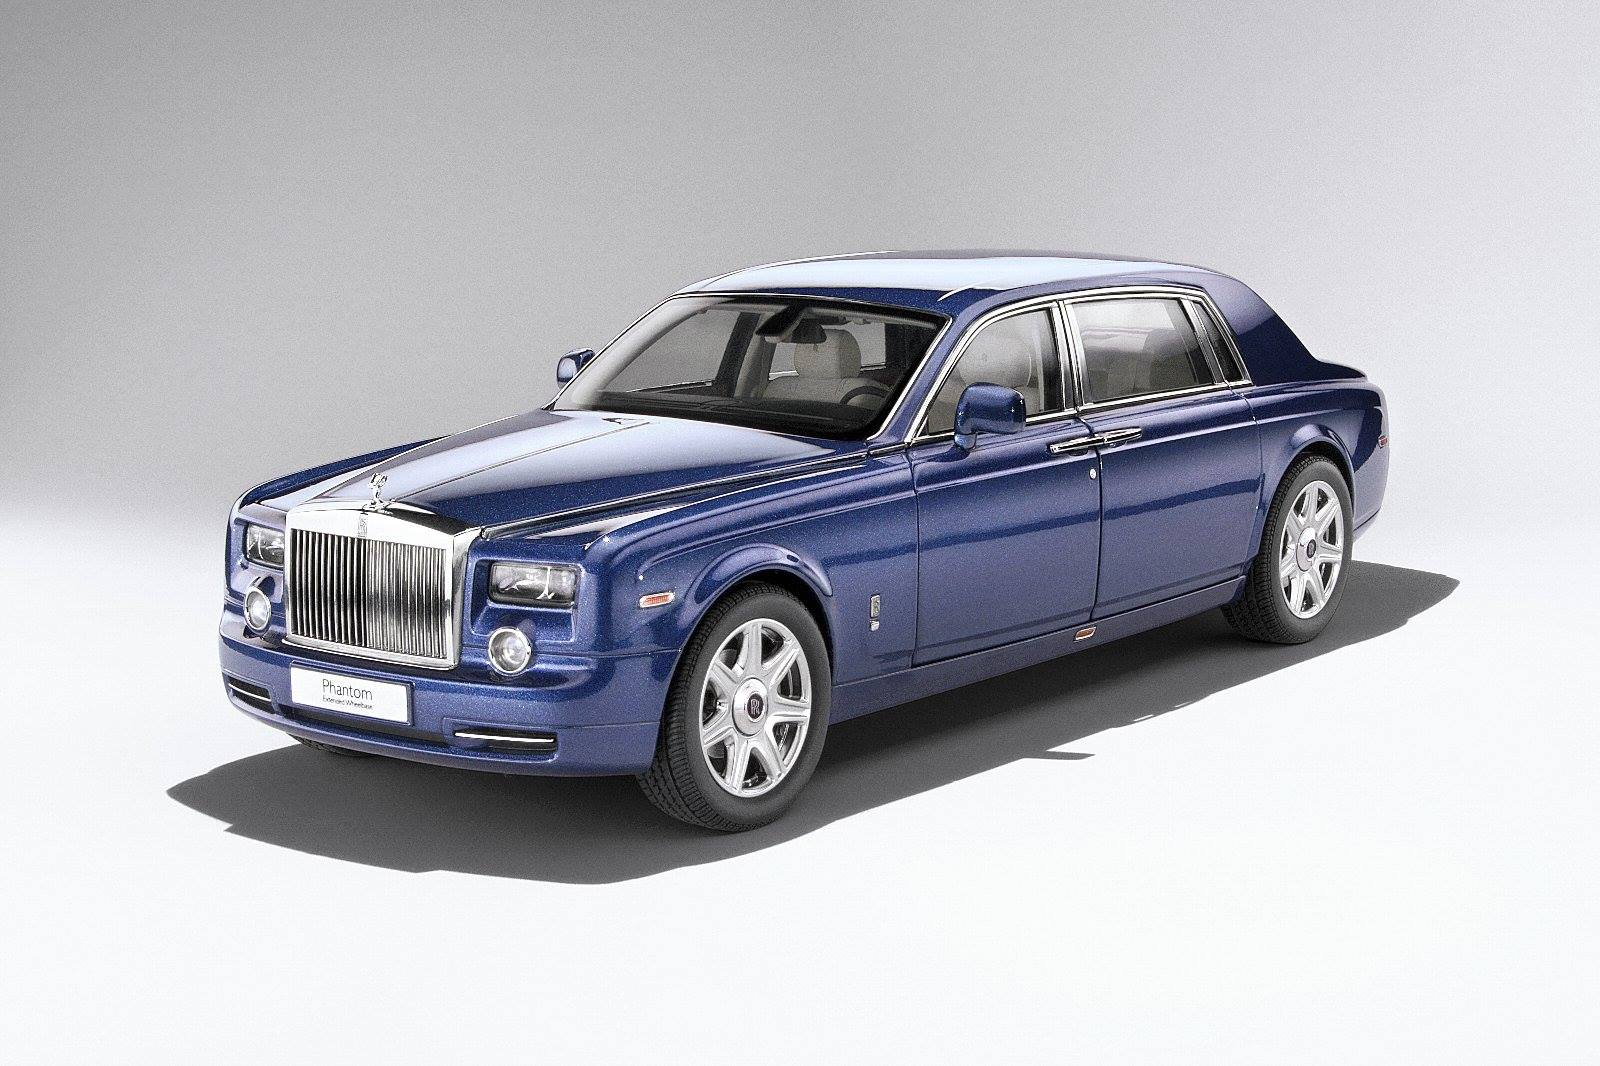 by 1/18 Extended 京商 Rolls Wheelbase Kyosho 2015年モデル Phantom 1:18 エステンディド・ホィールベース Series ブルックランド ファントム EUR Royce brooklands I, Kyosho ロールスロイス 2015